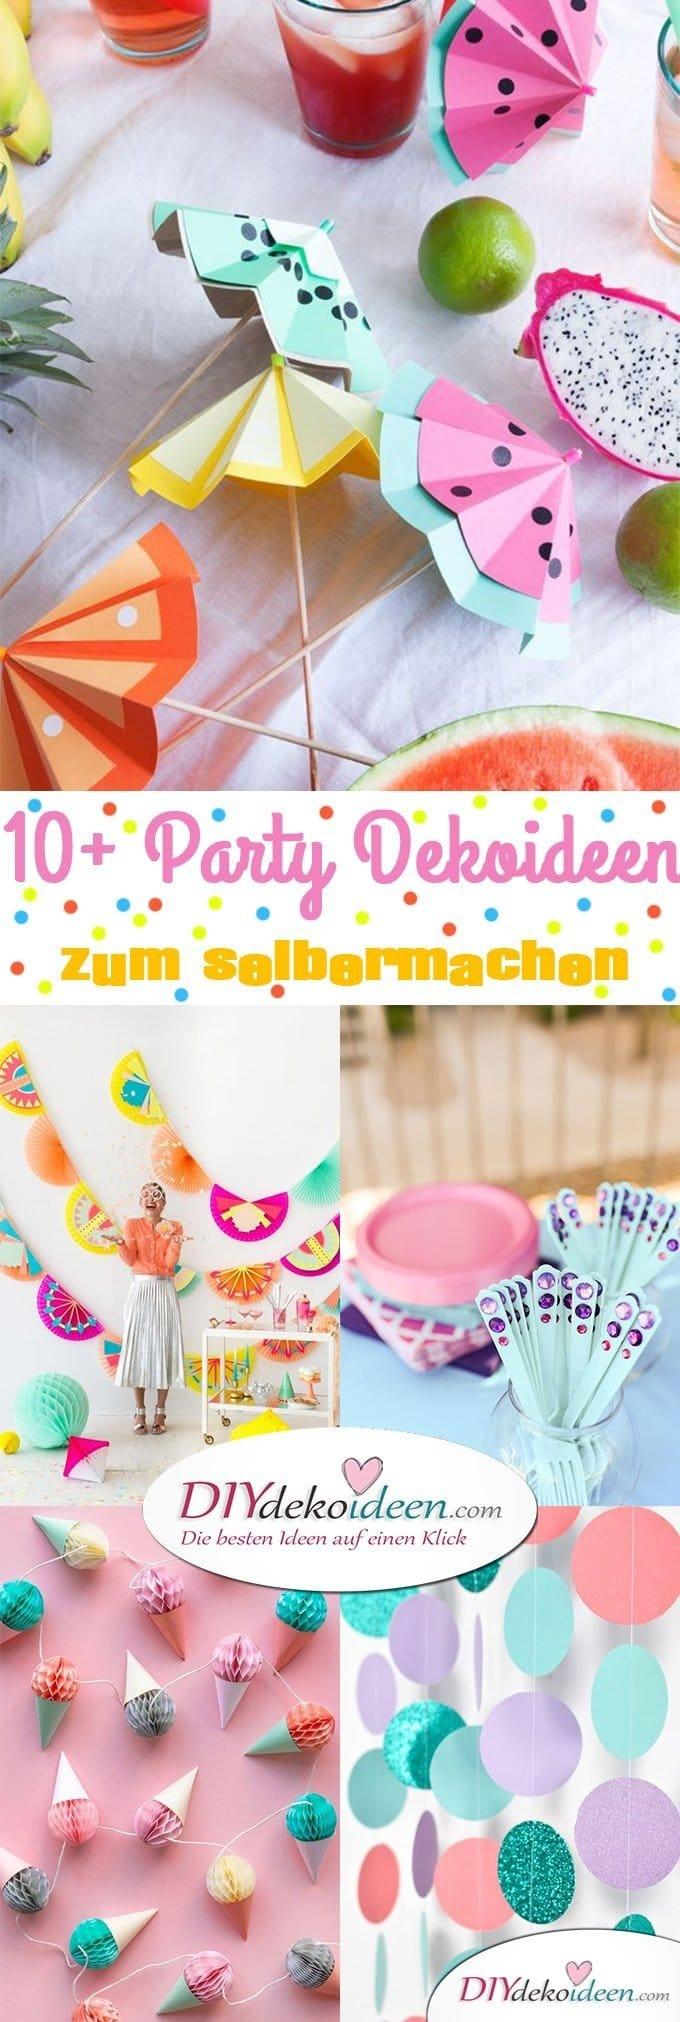 DIY Party Dekoideen zum selber machen, Partydeko Ideen, Party dekorieren, Geburtstagsparty Deko, Deko selber machen,